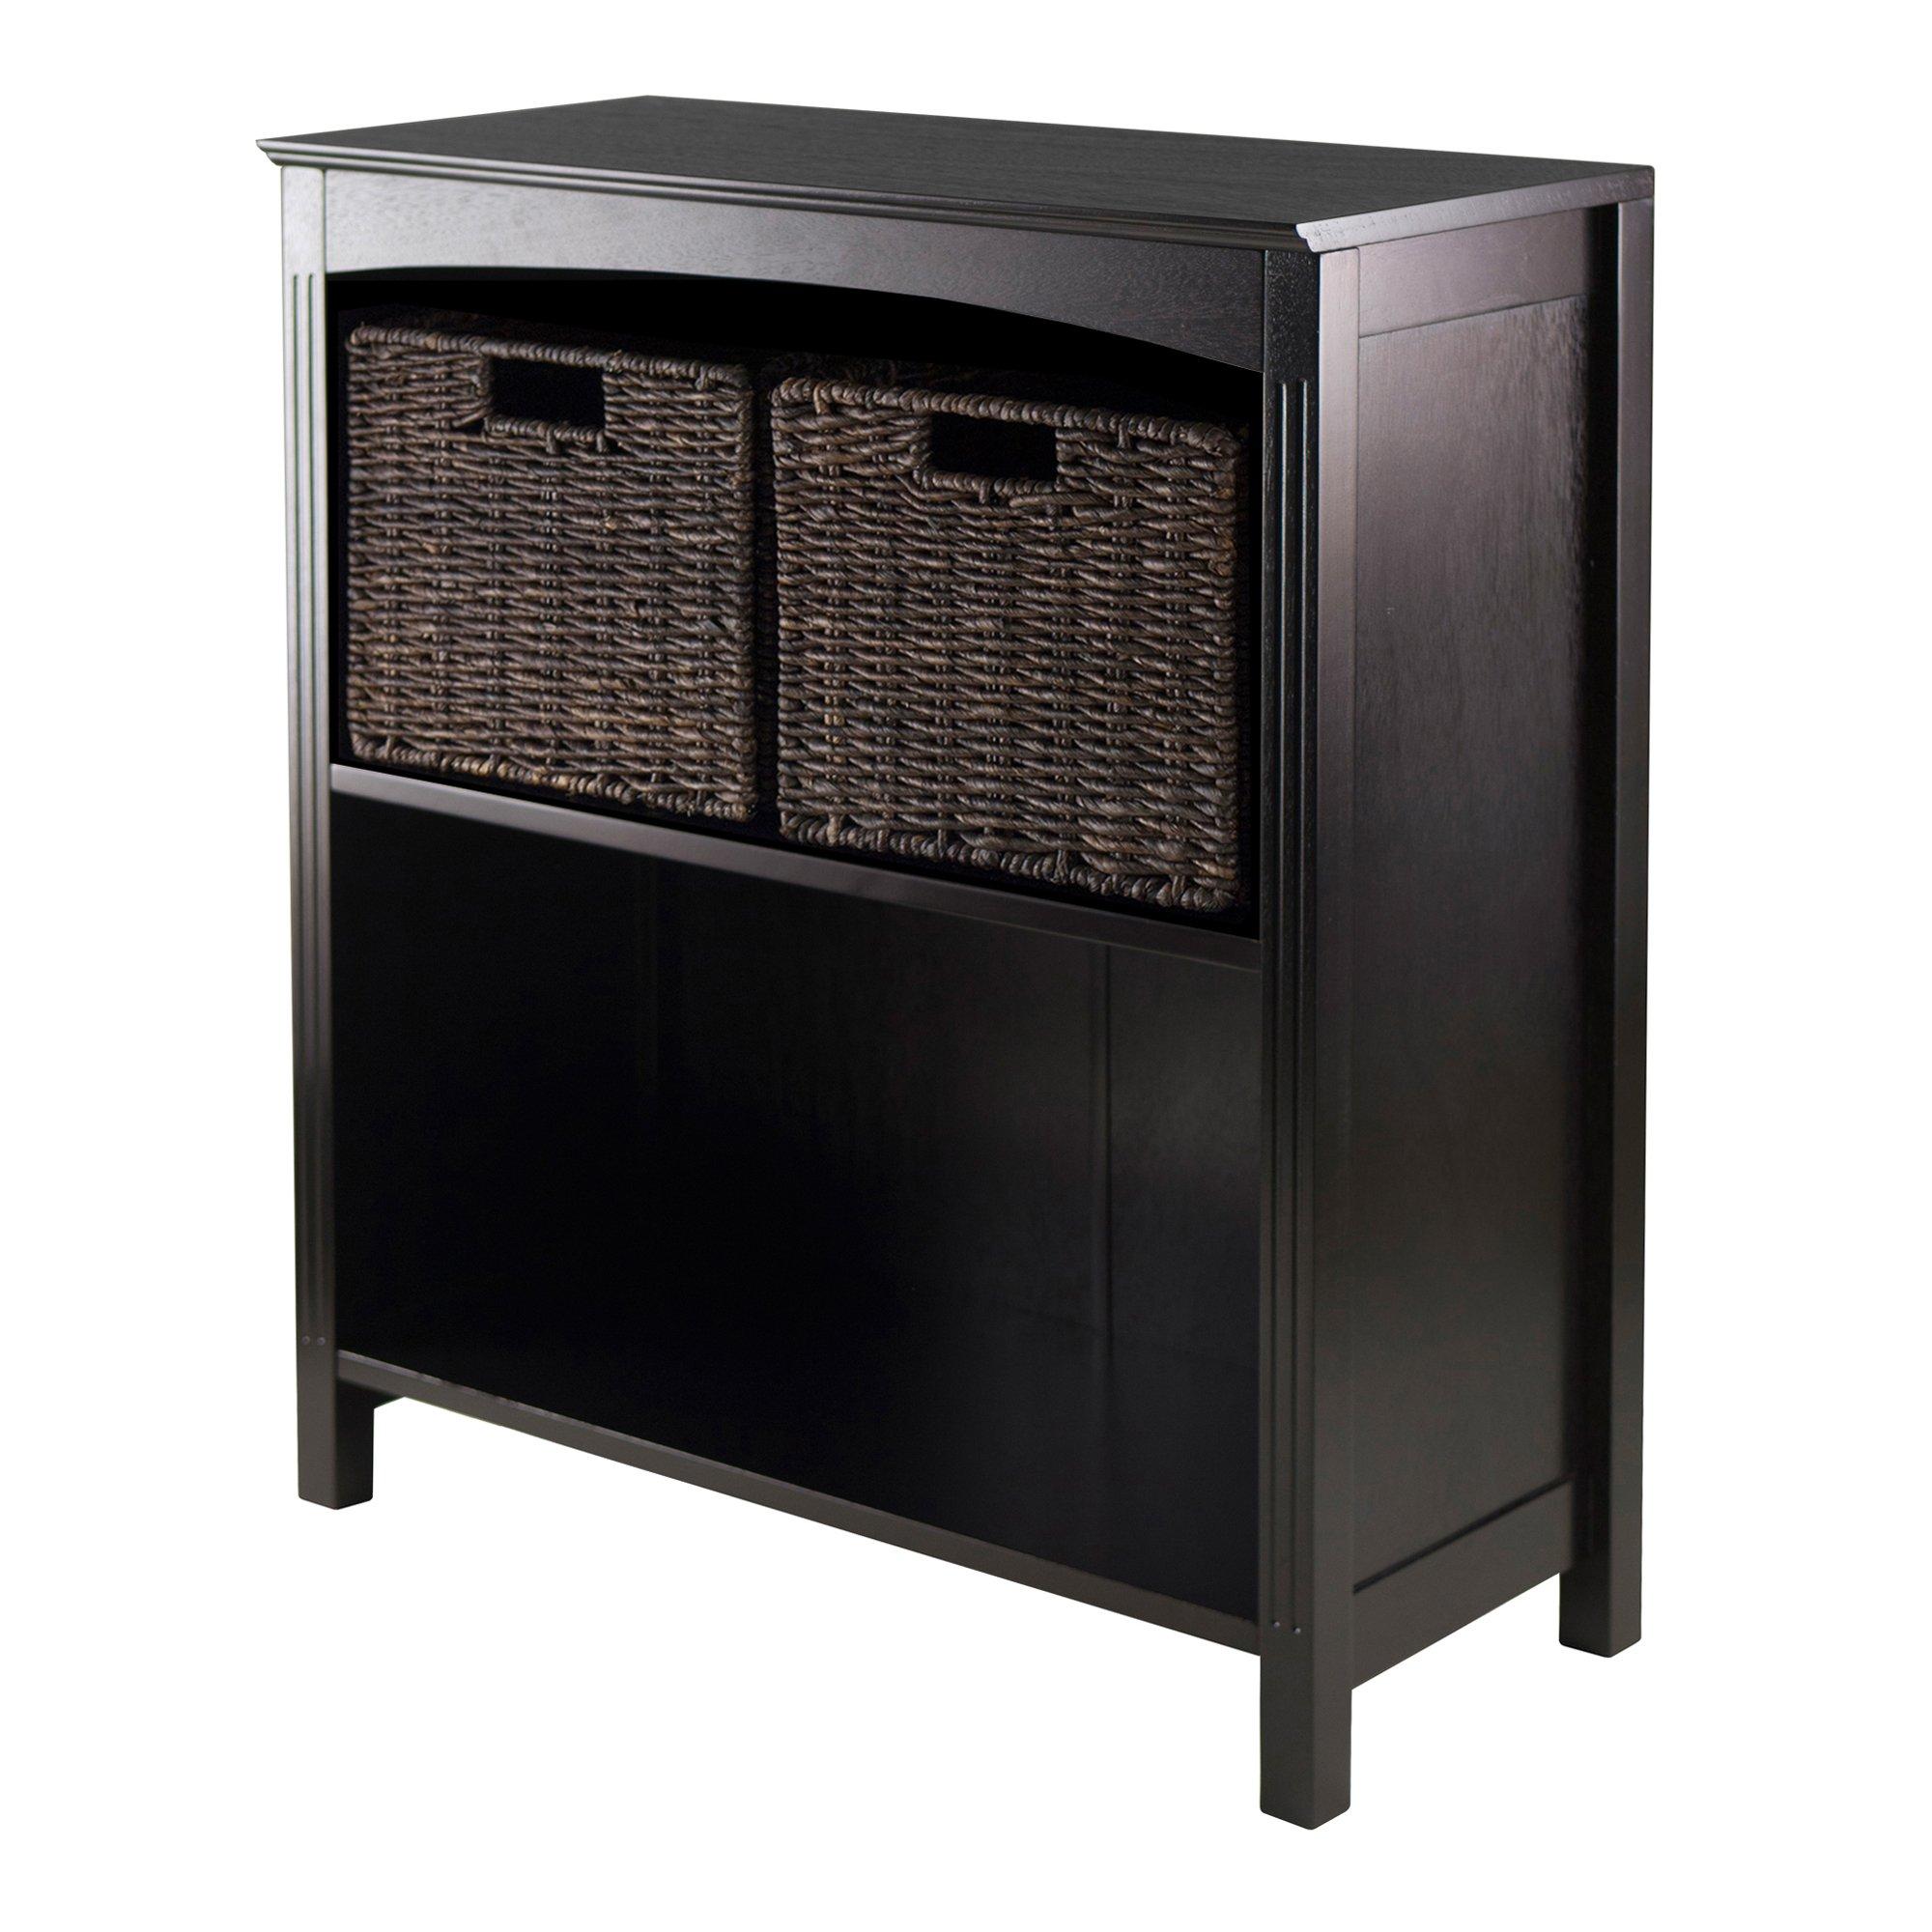 Winsome Terrace 3-Piece Storage Shelf/Bookcase, 26 by 11.8 by 30-Inch